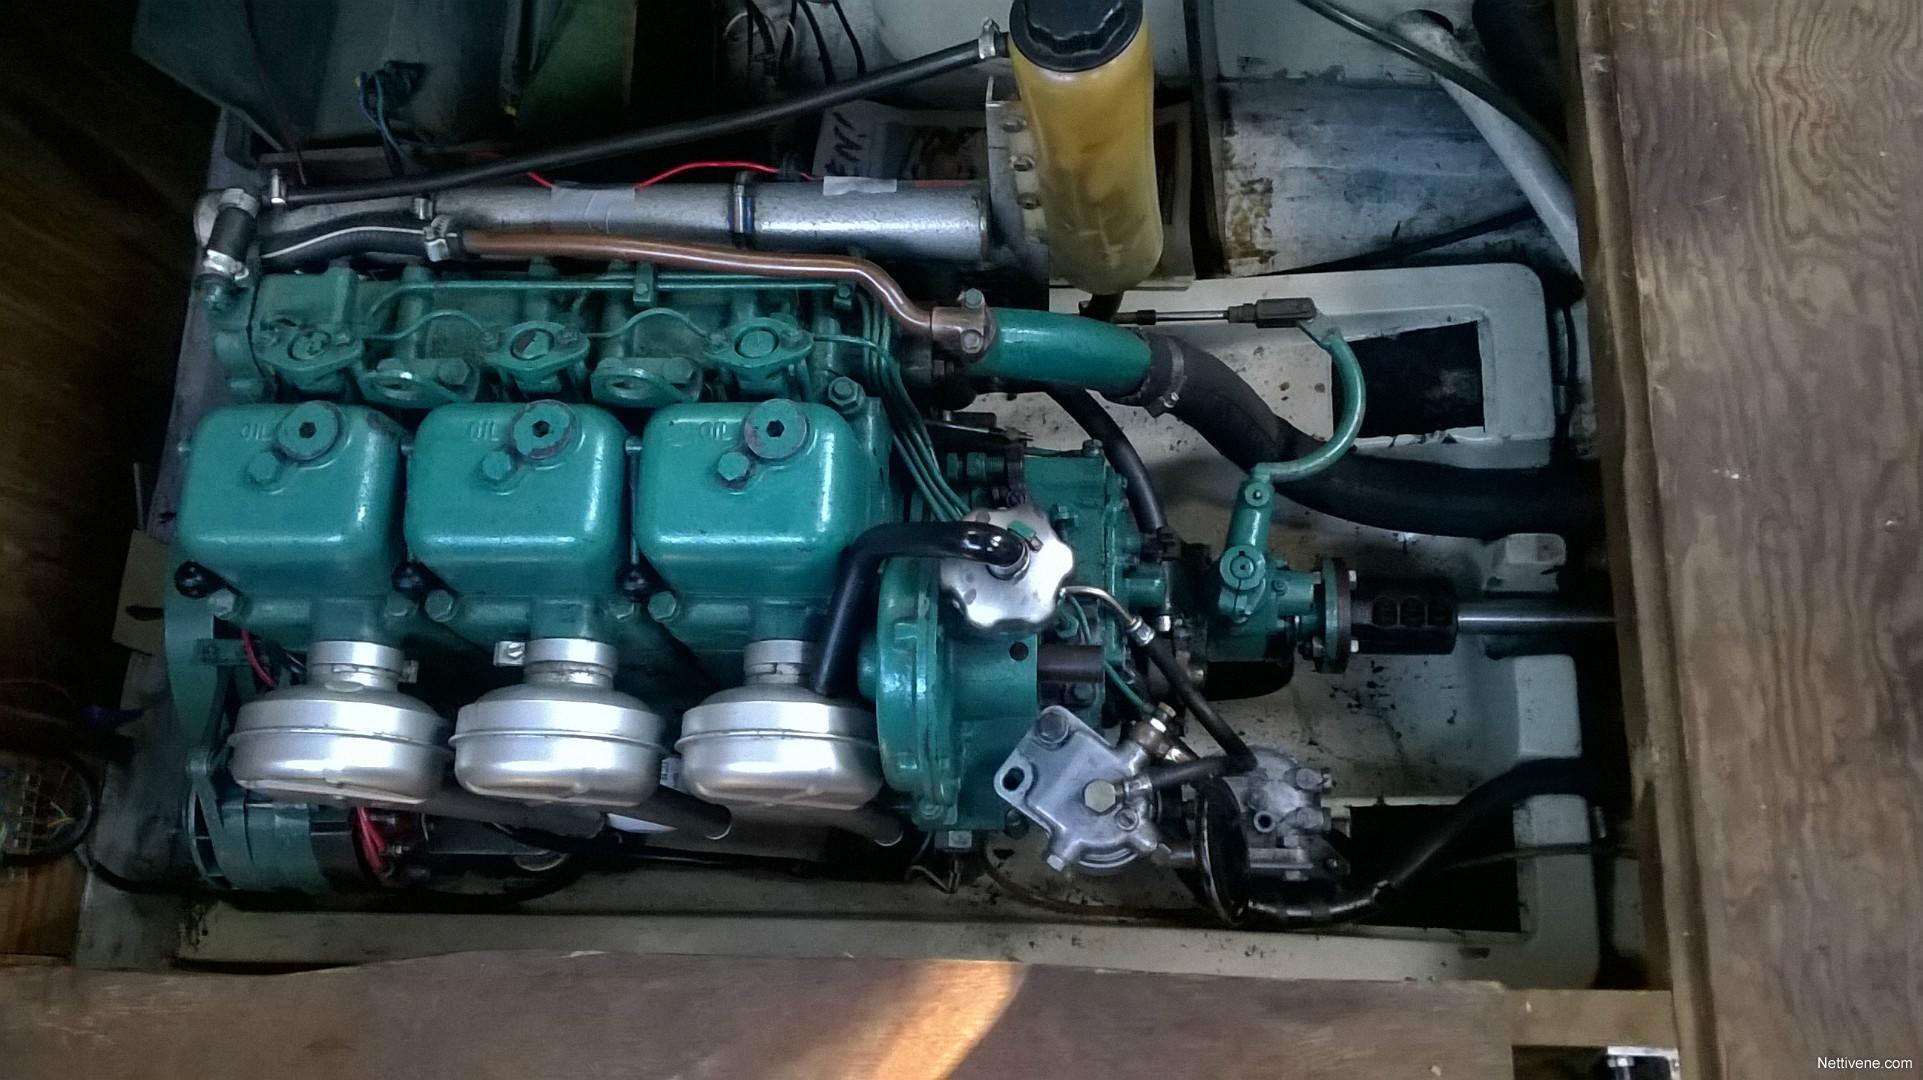 Volvo penta md3b engine 1975 raasepori nettivene enlarge image moottori volvo penta publicscrutiny Choice Image